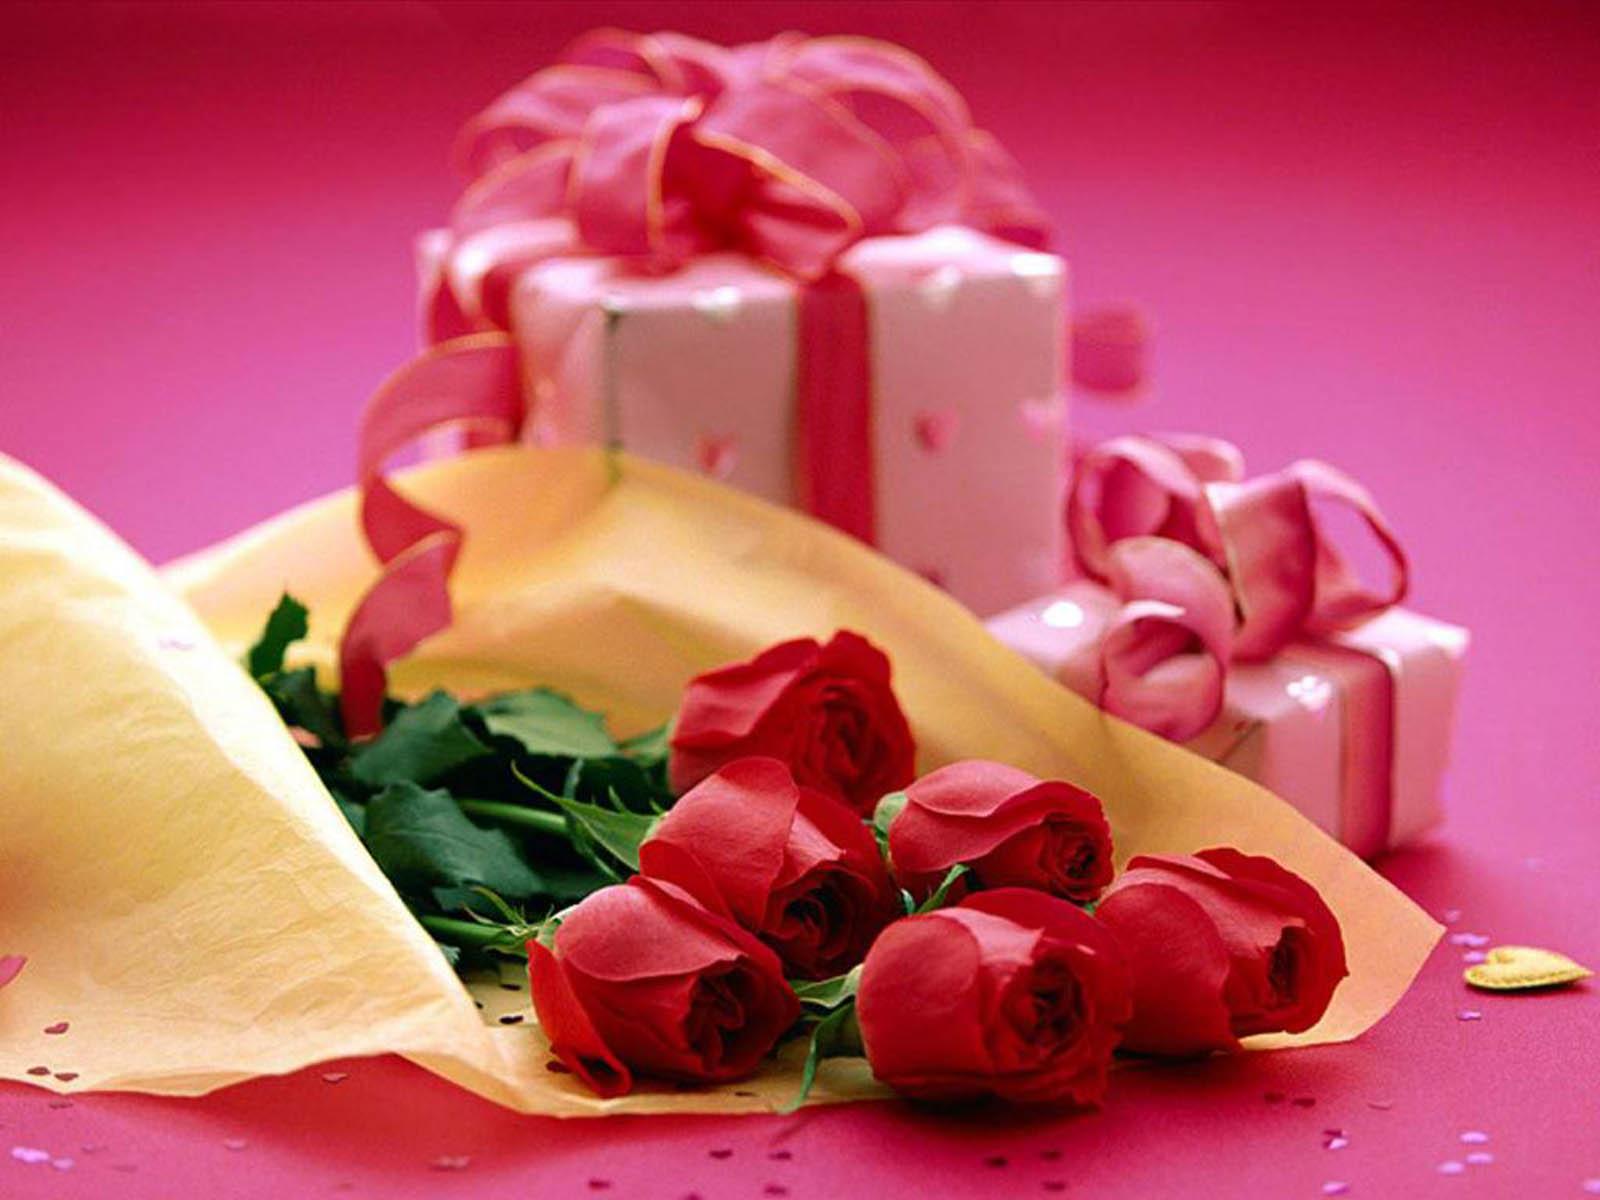 https://2.bp.blogspot.com/-rkOK4sI1-vw/T-XO0ZrtzEI/AAAAAAAAEZY/bWnV-6UWGKM/s1600/Valentine%27s%2BDay%2BGifts%2B1.jpg